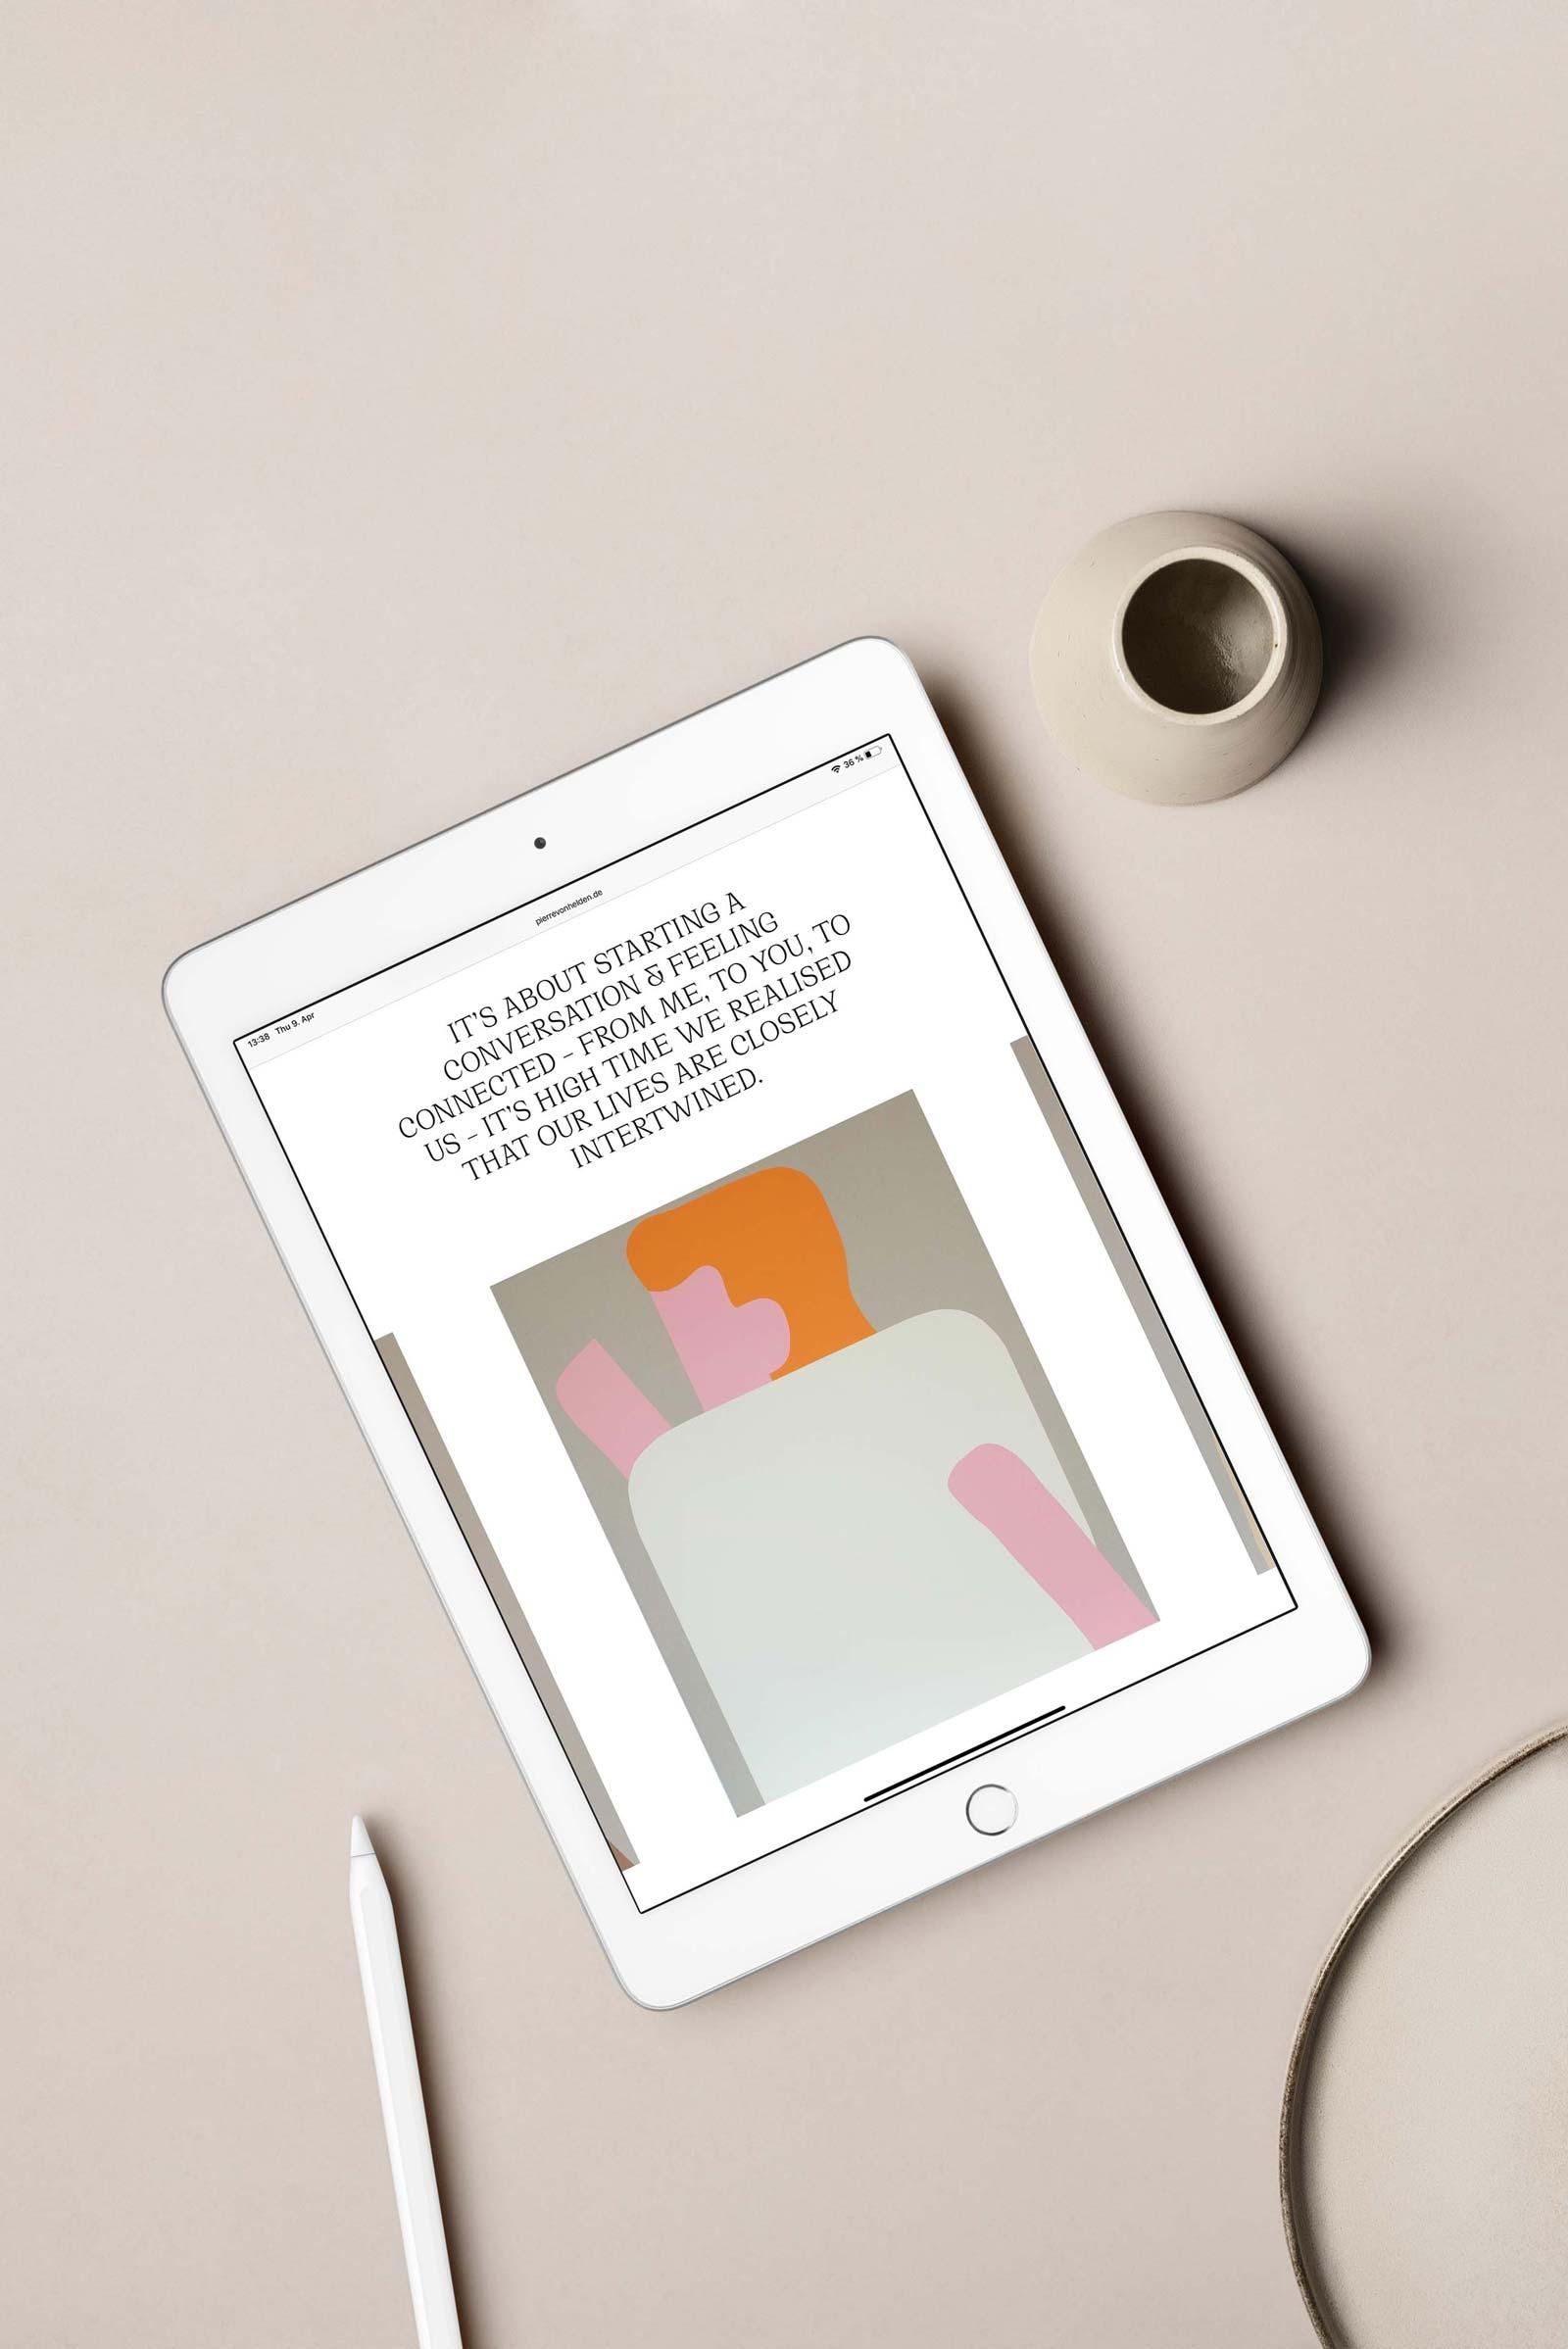 Pierre von Helden Artist Branding – Responsive Web Design